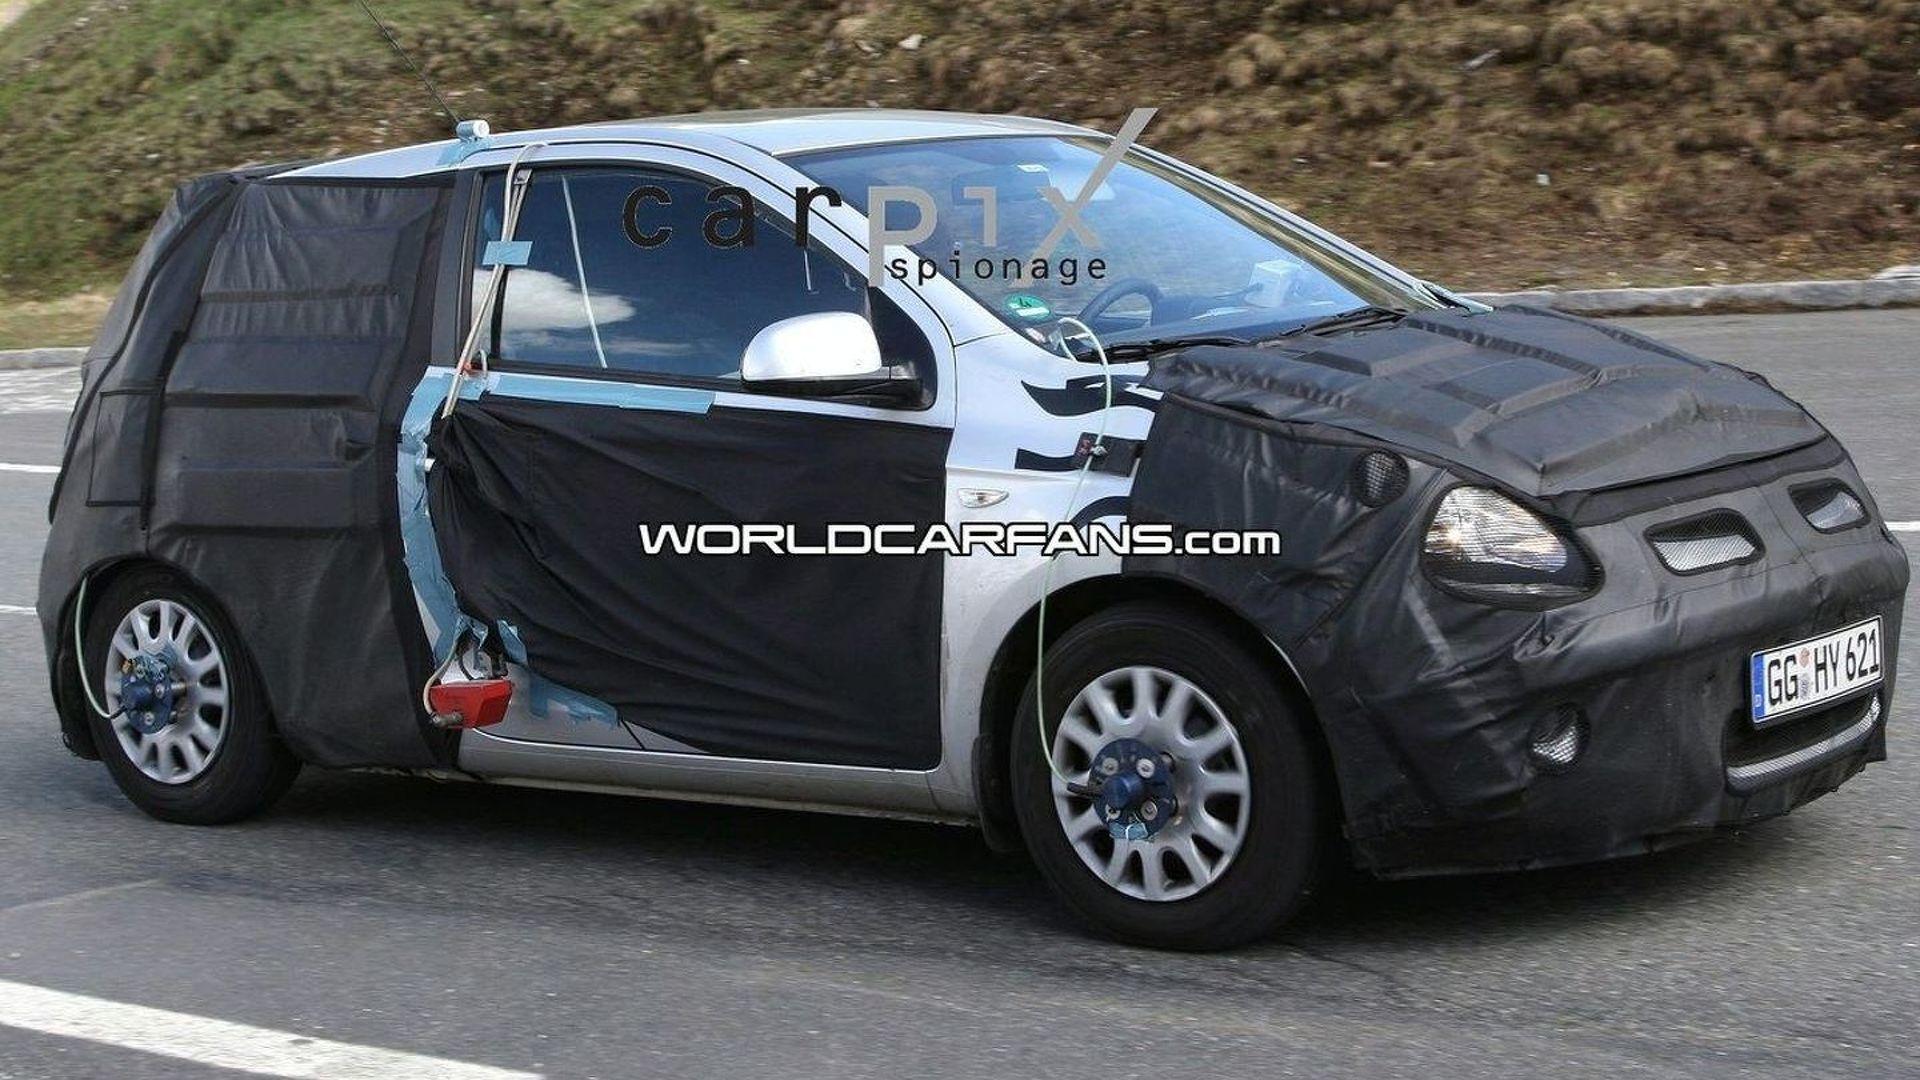 Hyundai i20 3-door spy photos